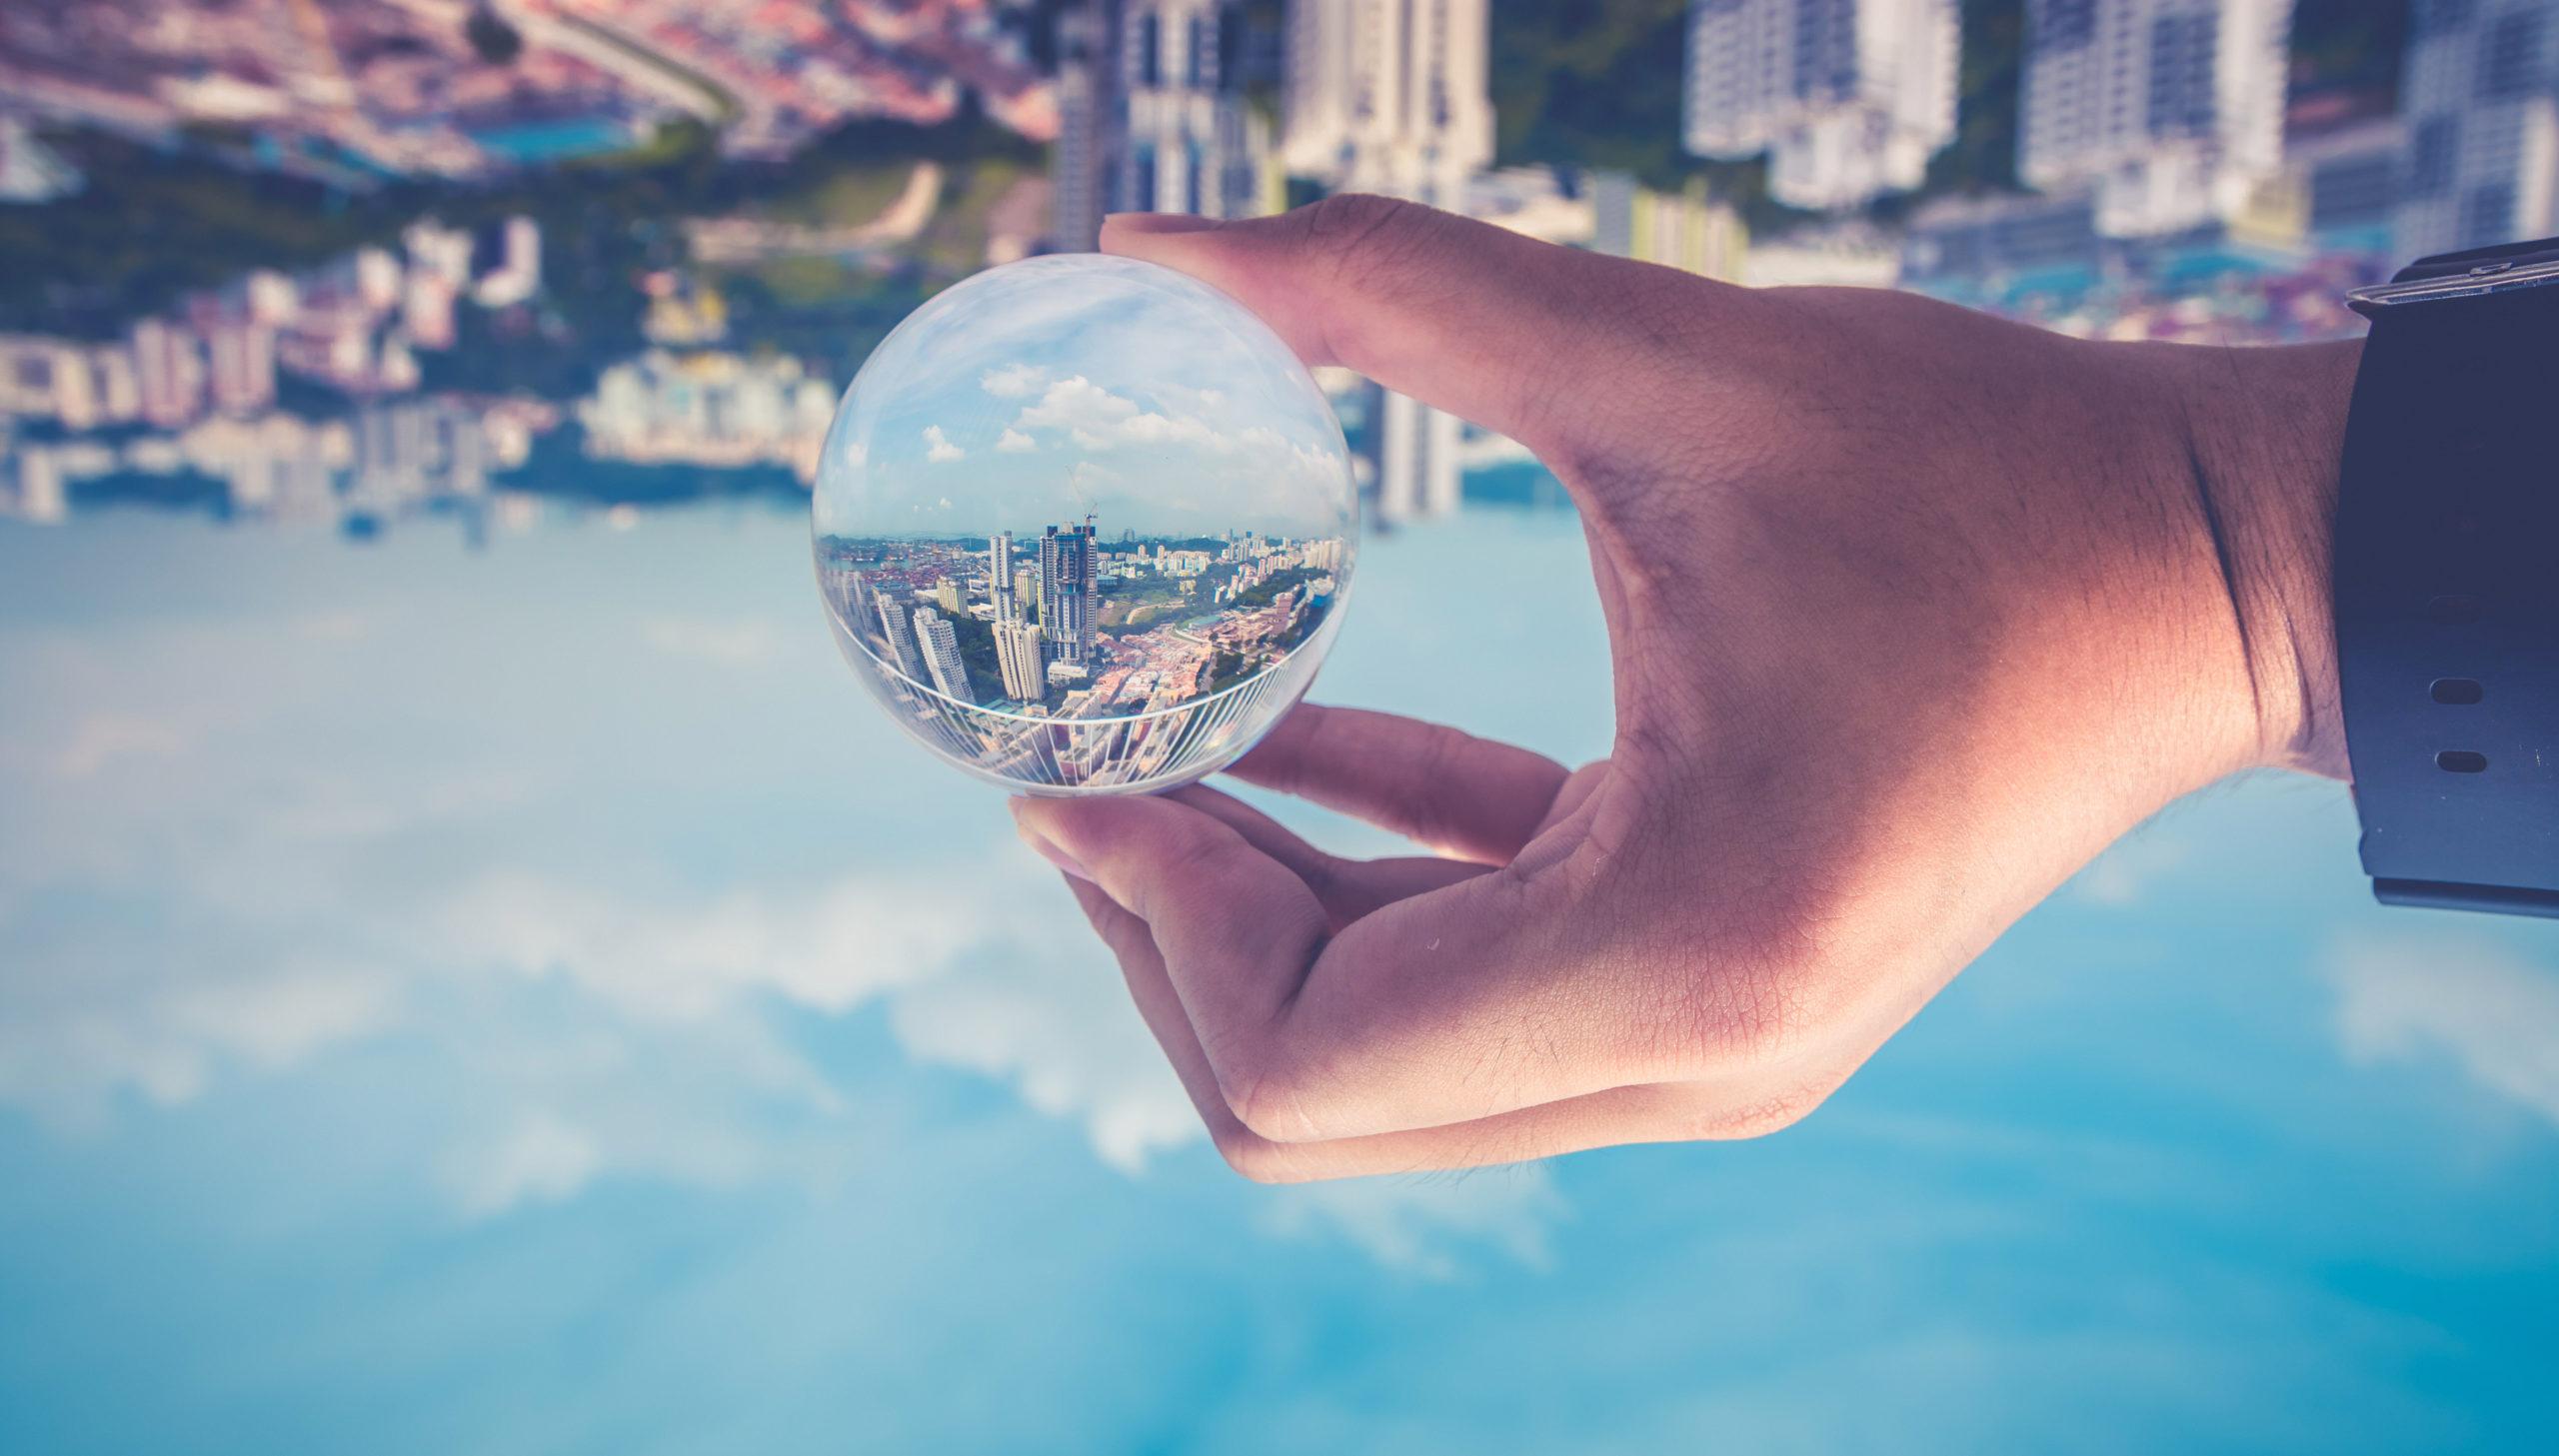 futures-thinking-now-examining-assumptions-future-scaled